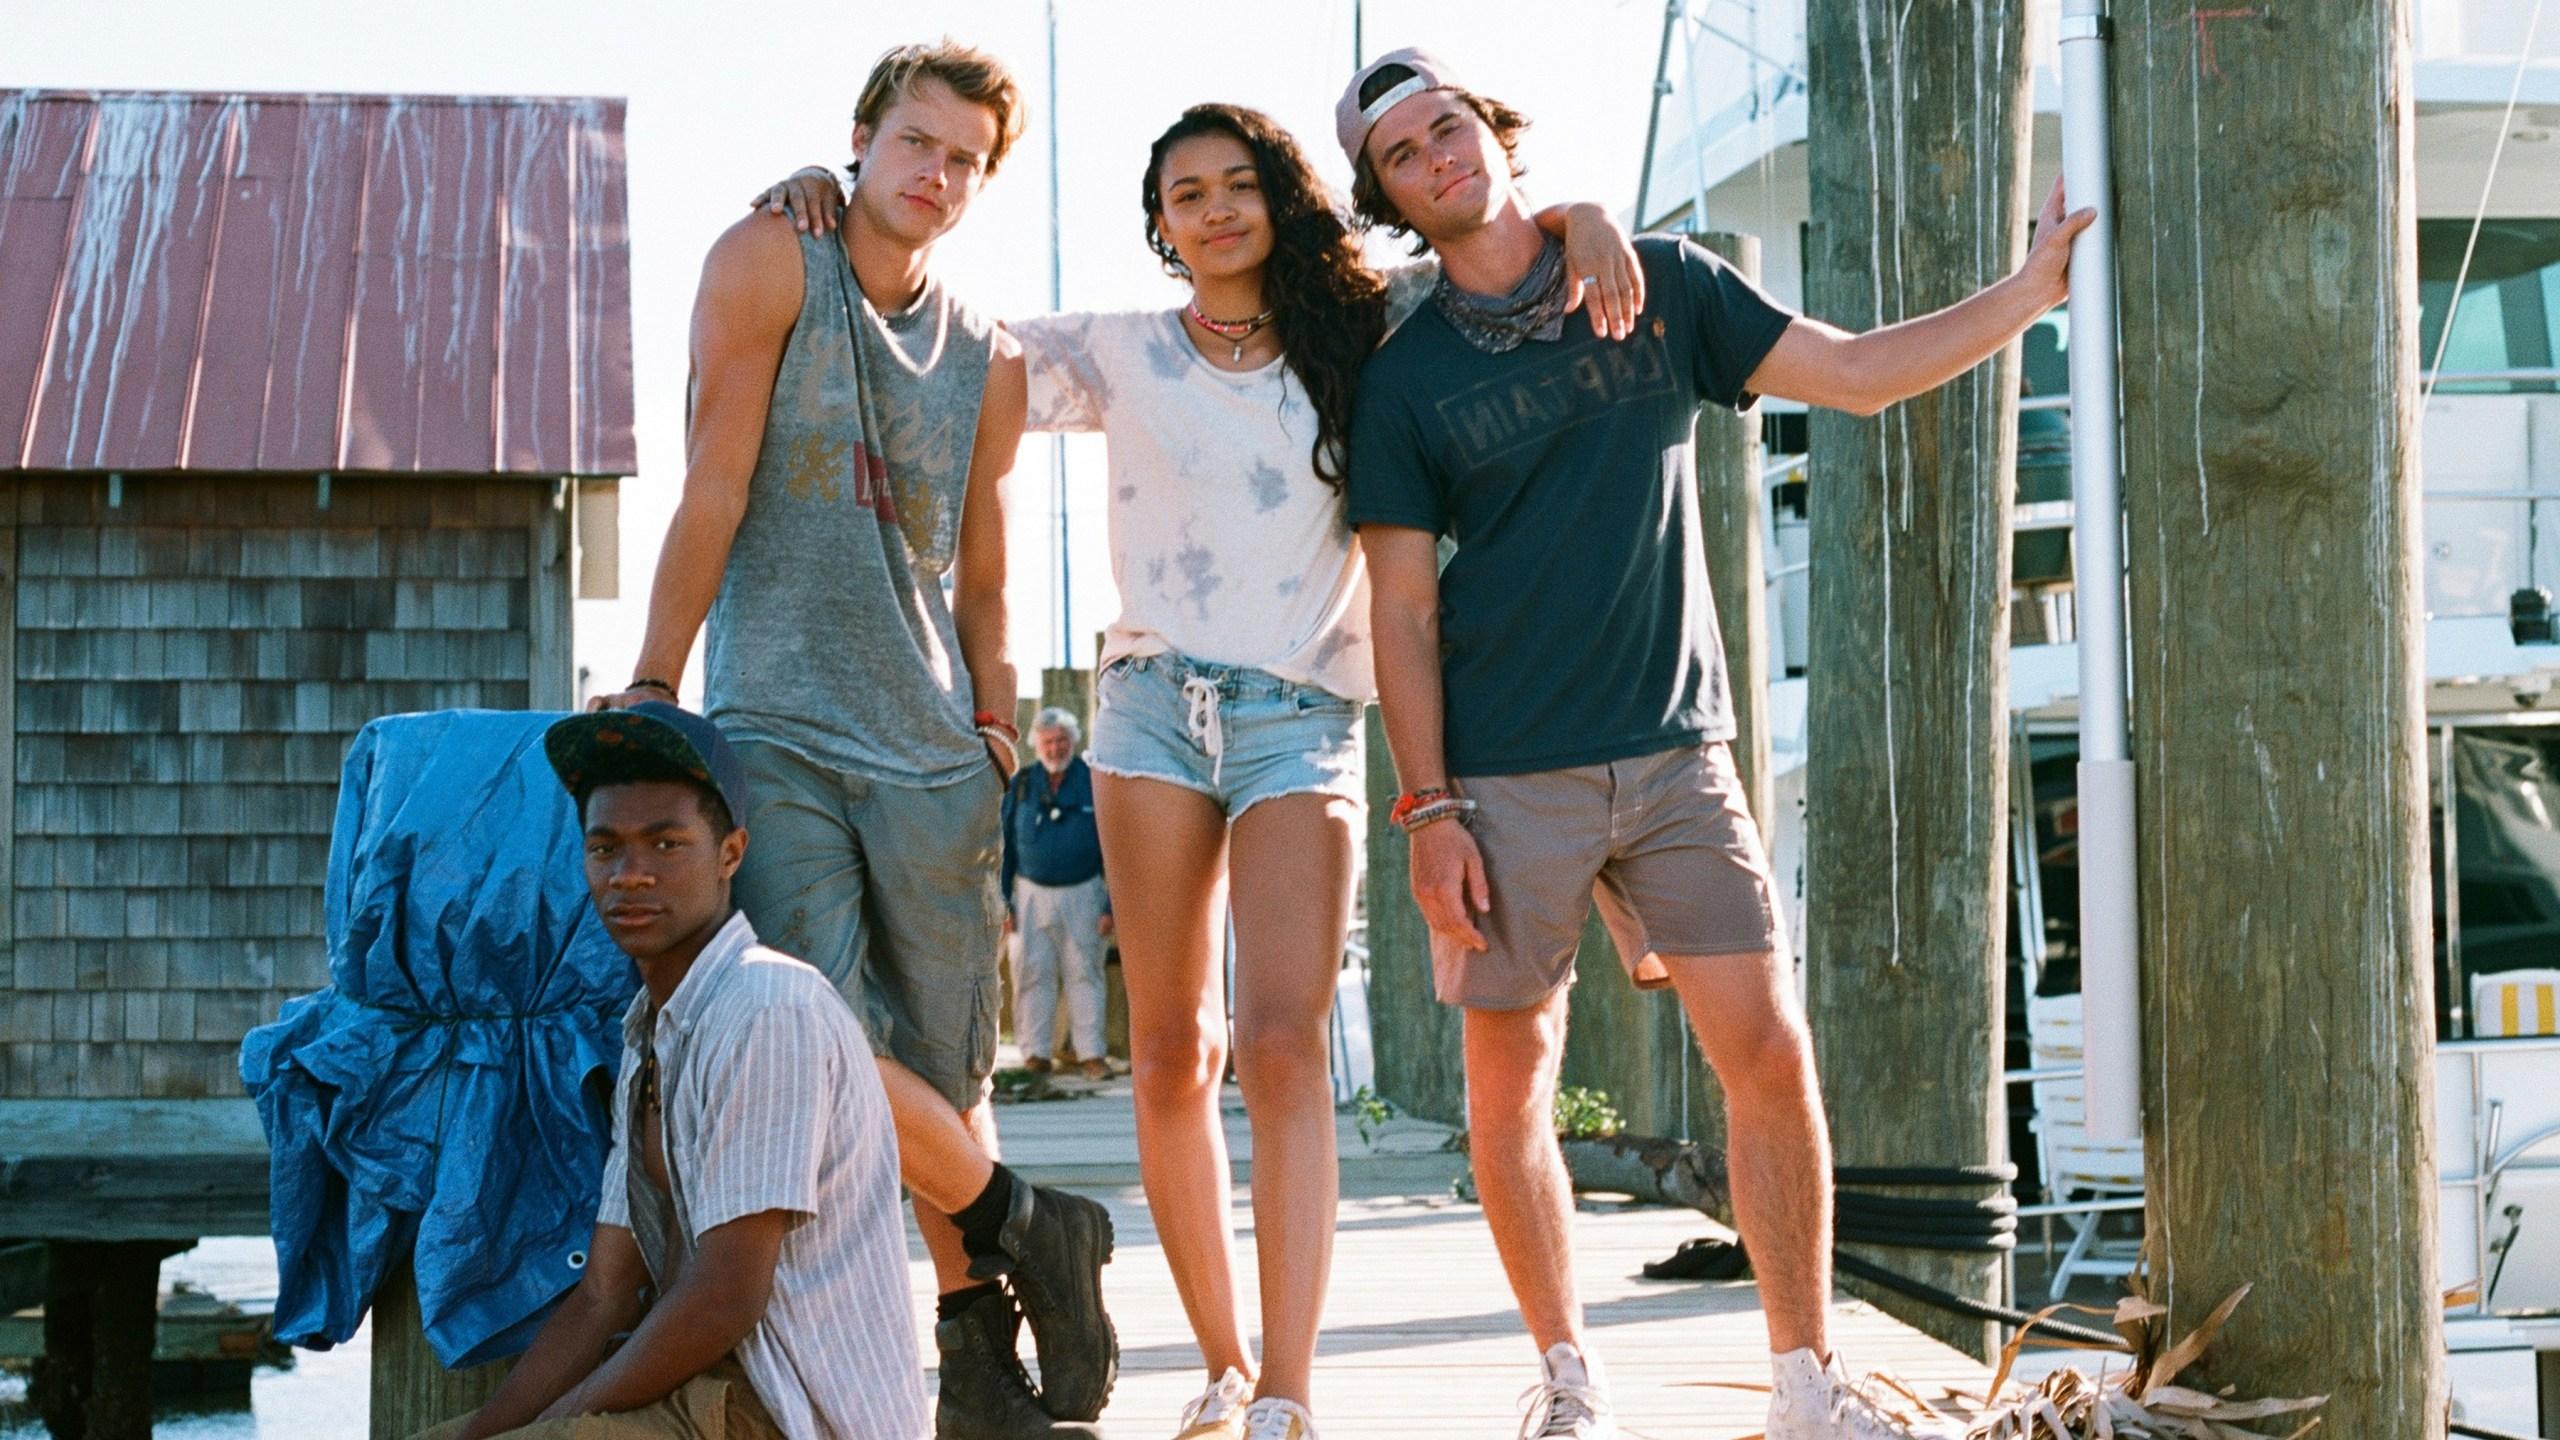 The four main characters of Outer Banks: Pope (Jonathan Davis), JJ (Rudy Pankow), Kiara (Madison Bailey), and John B (Chase Stokes)